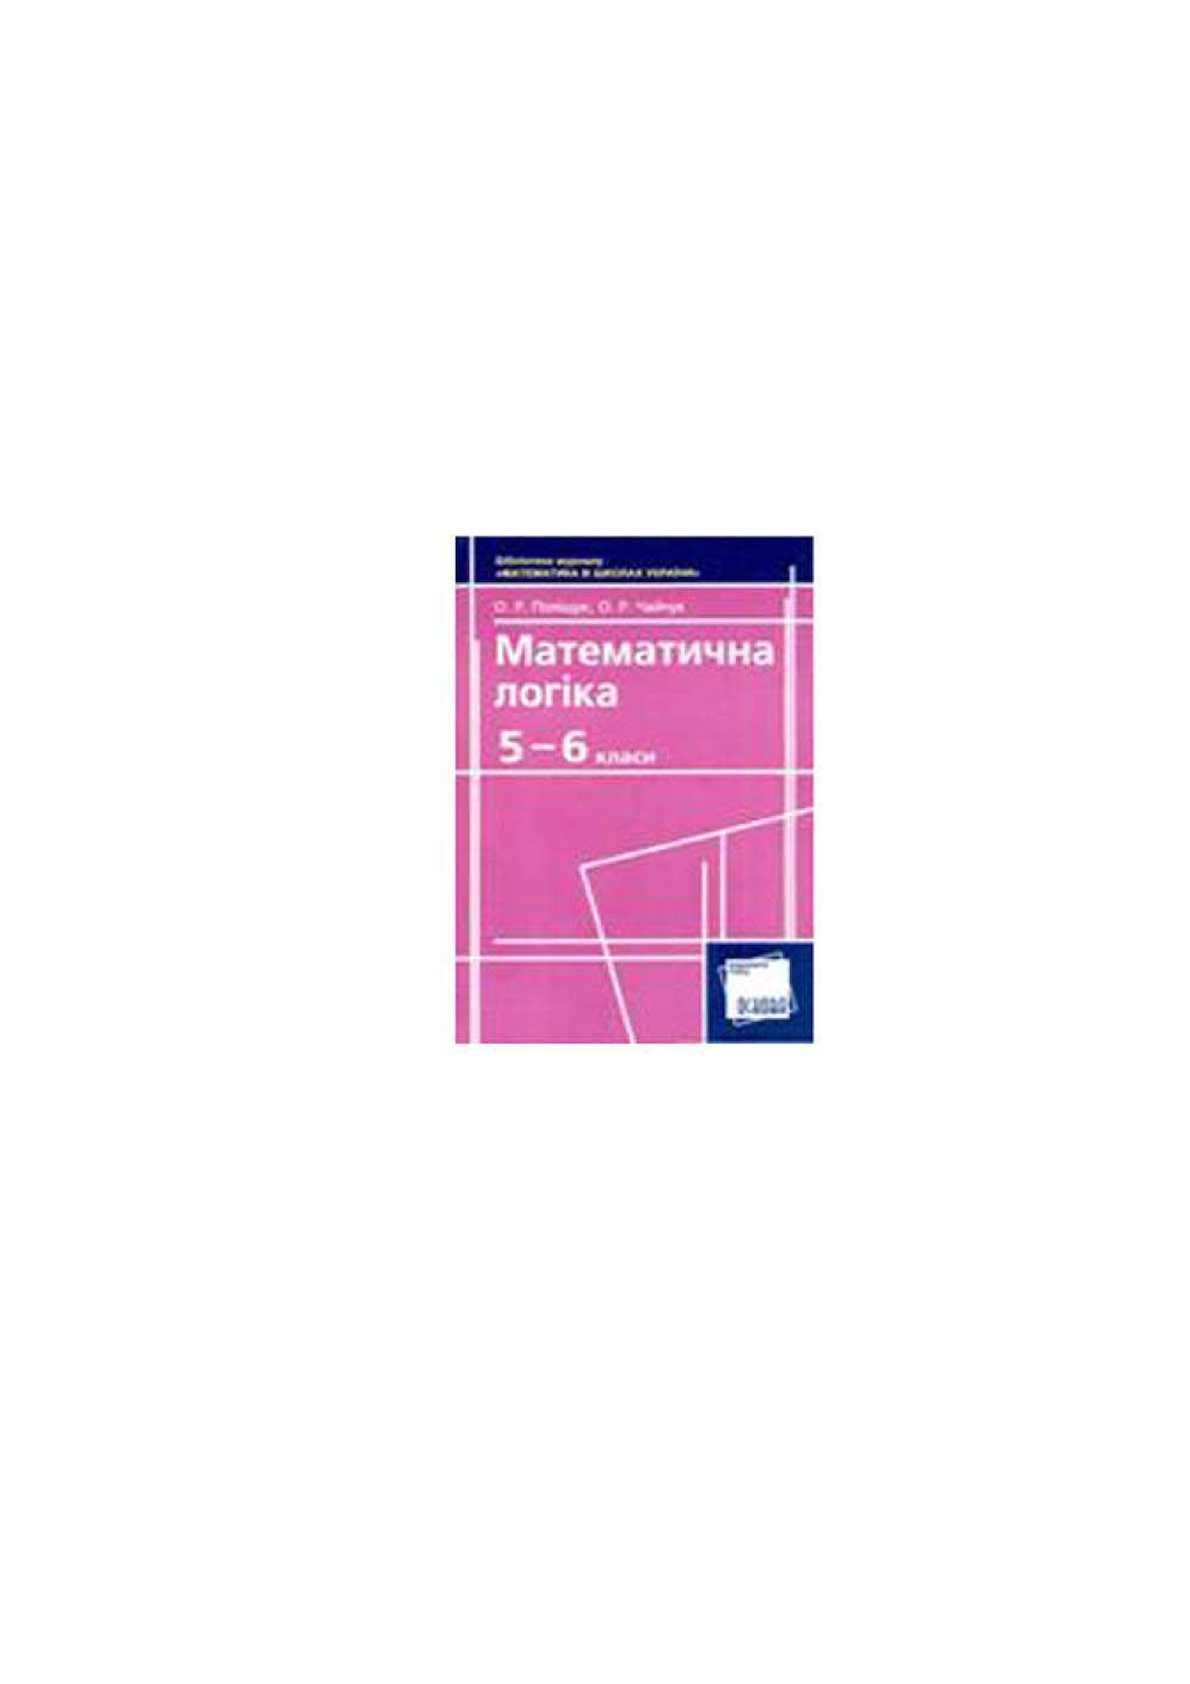 ISSUU PDF Downloader222 - CALAMEO Downloader